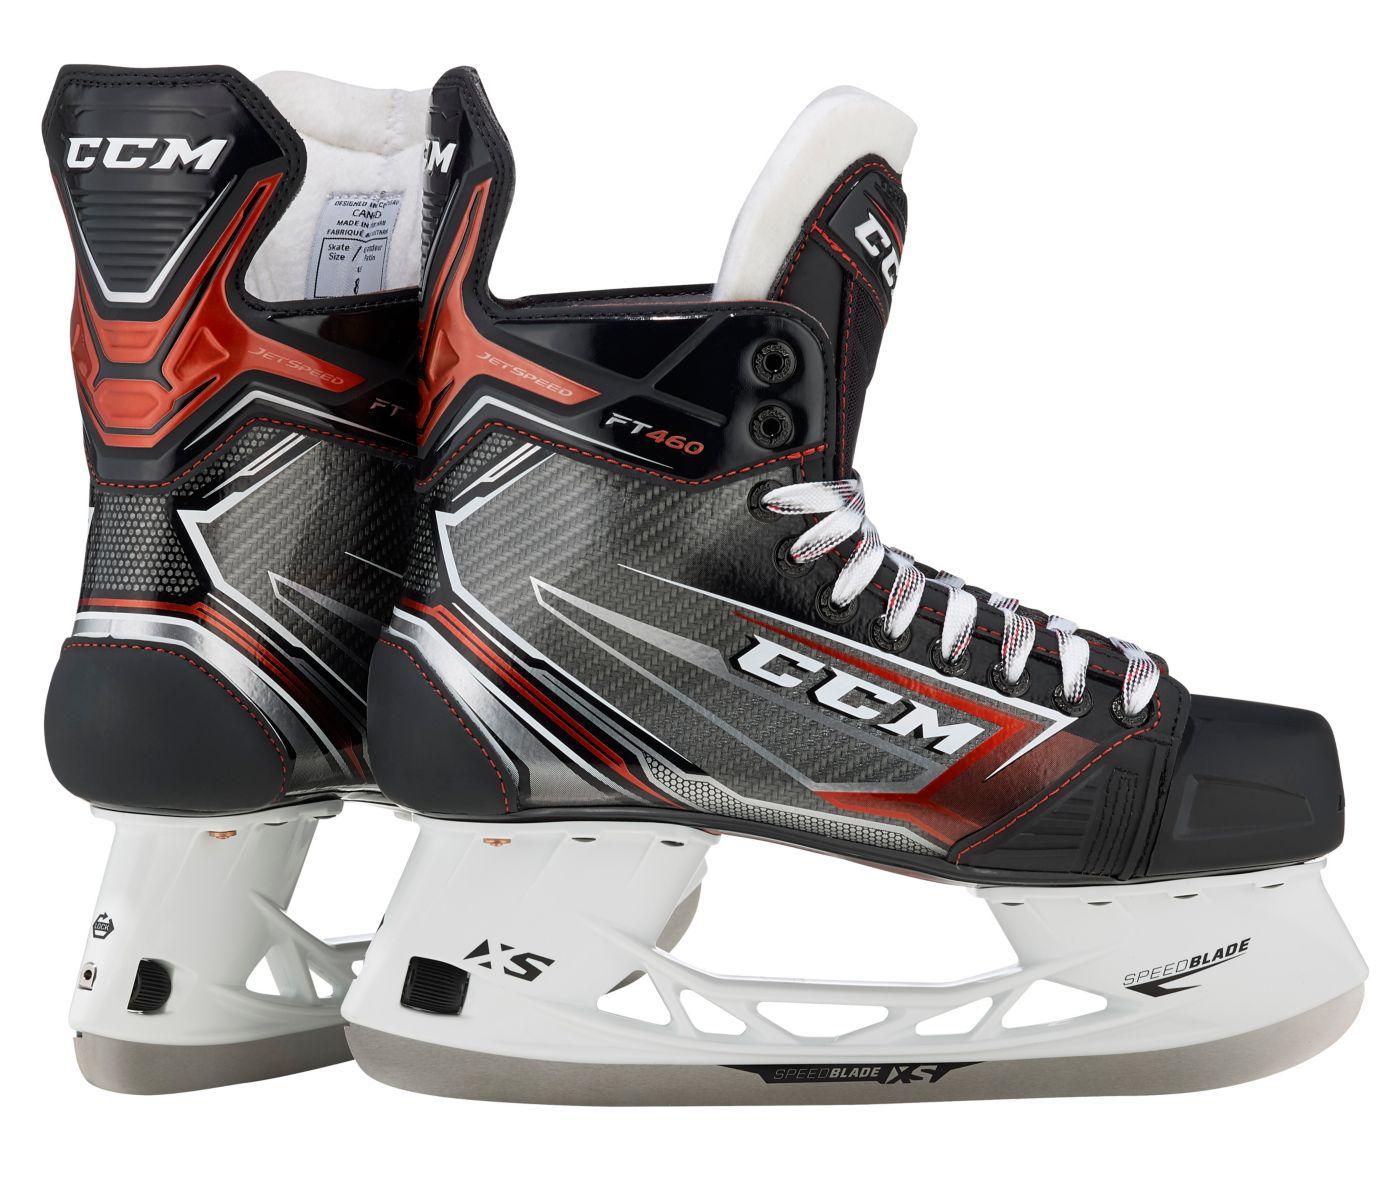 CCM Junior Jet Speed FT460 Ice Hockey Skates